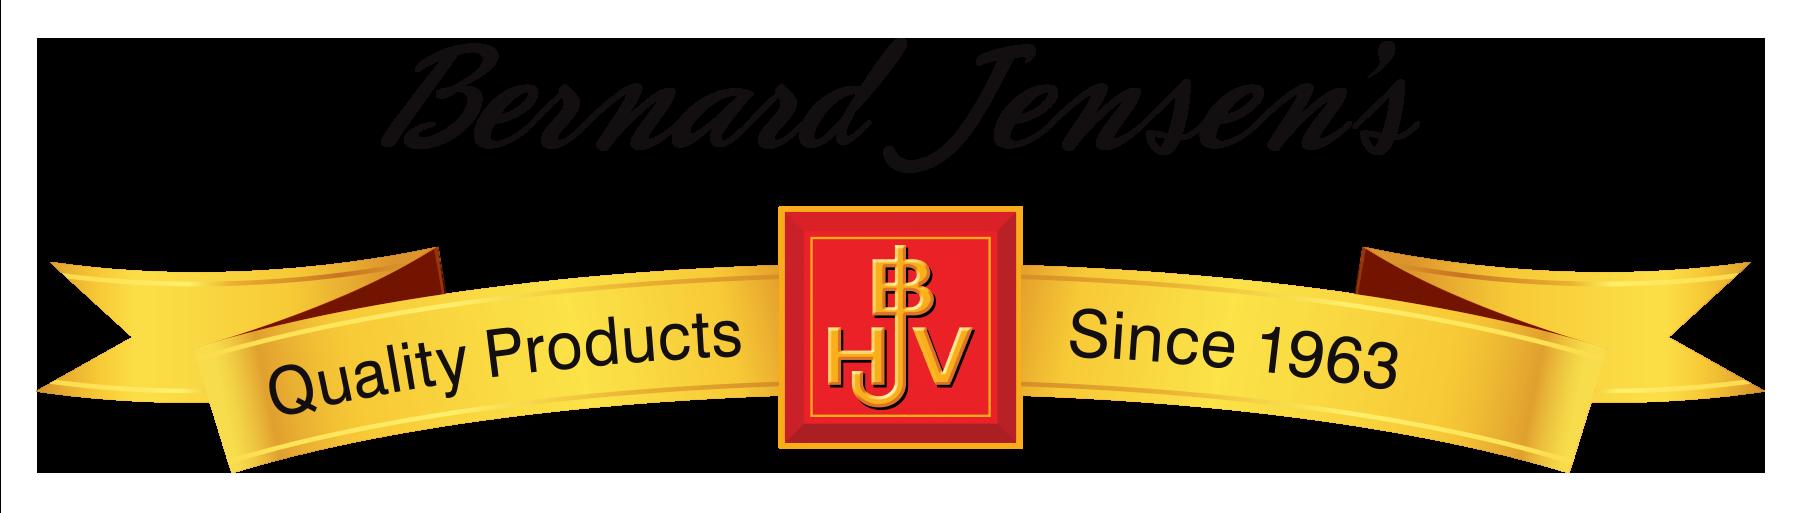 bjp-logo.png